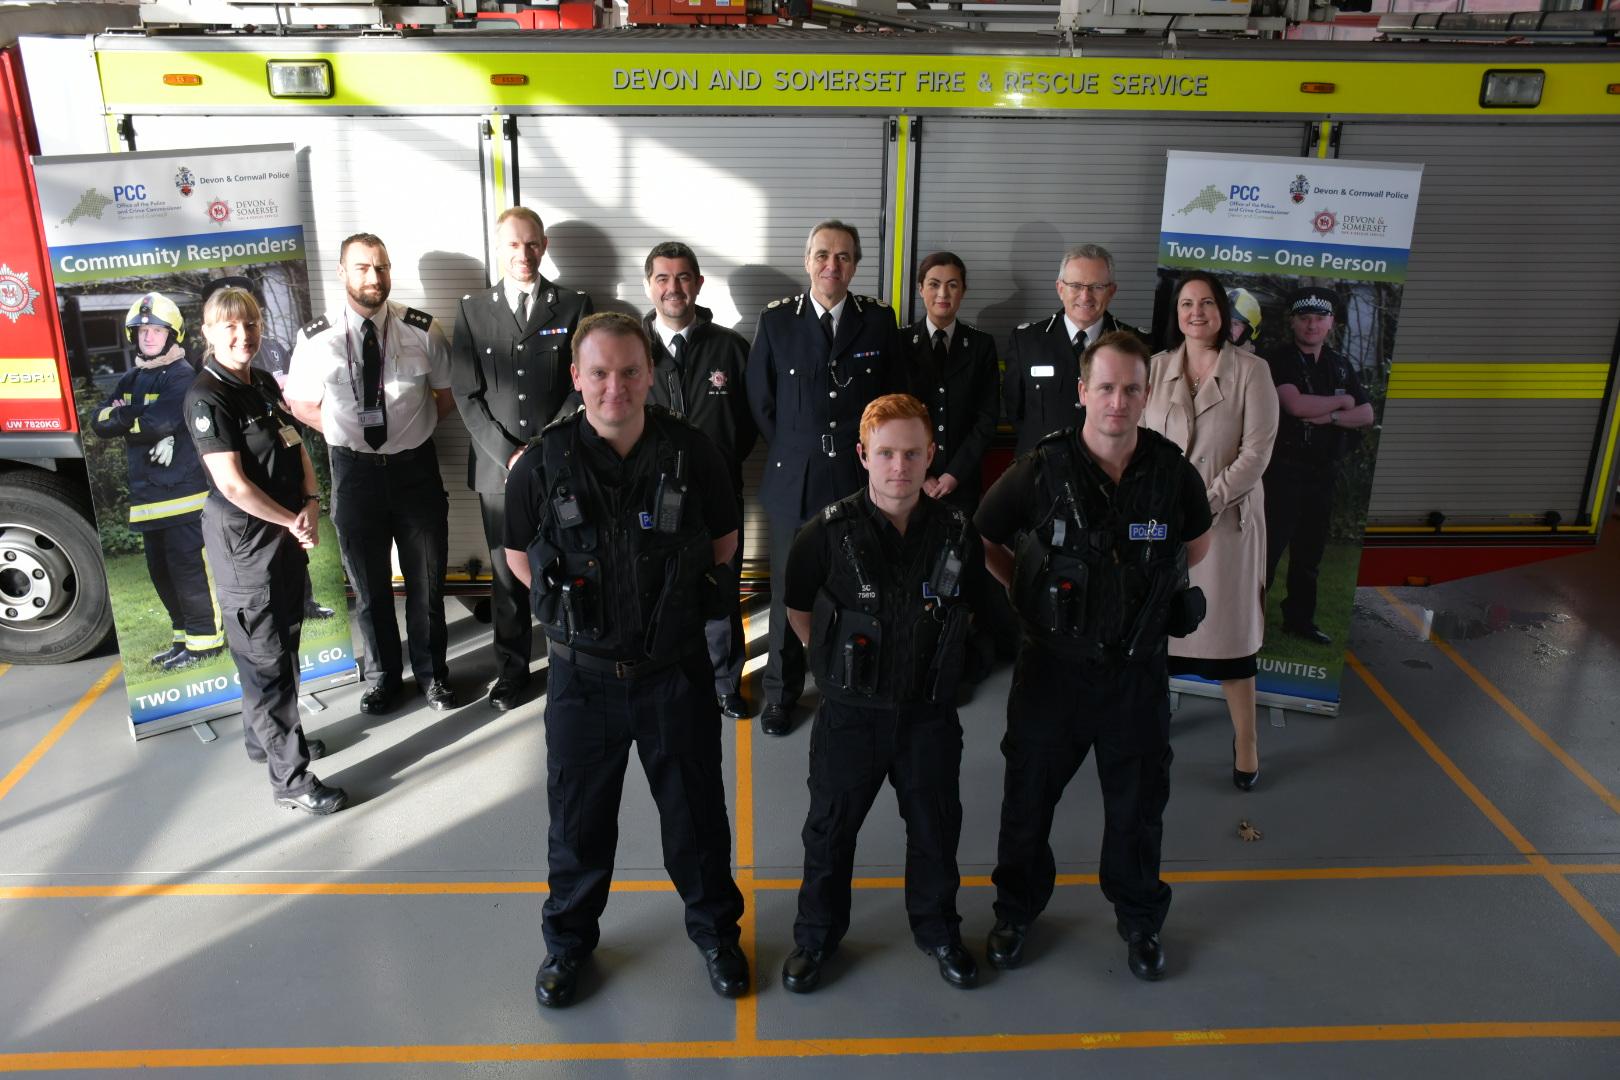 The 'supercops' serving Devon communities